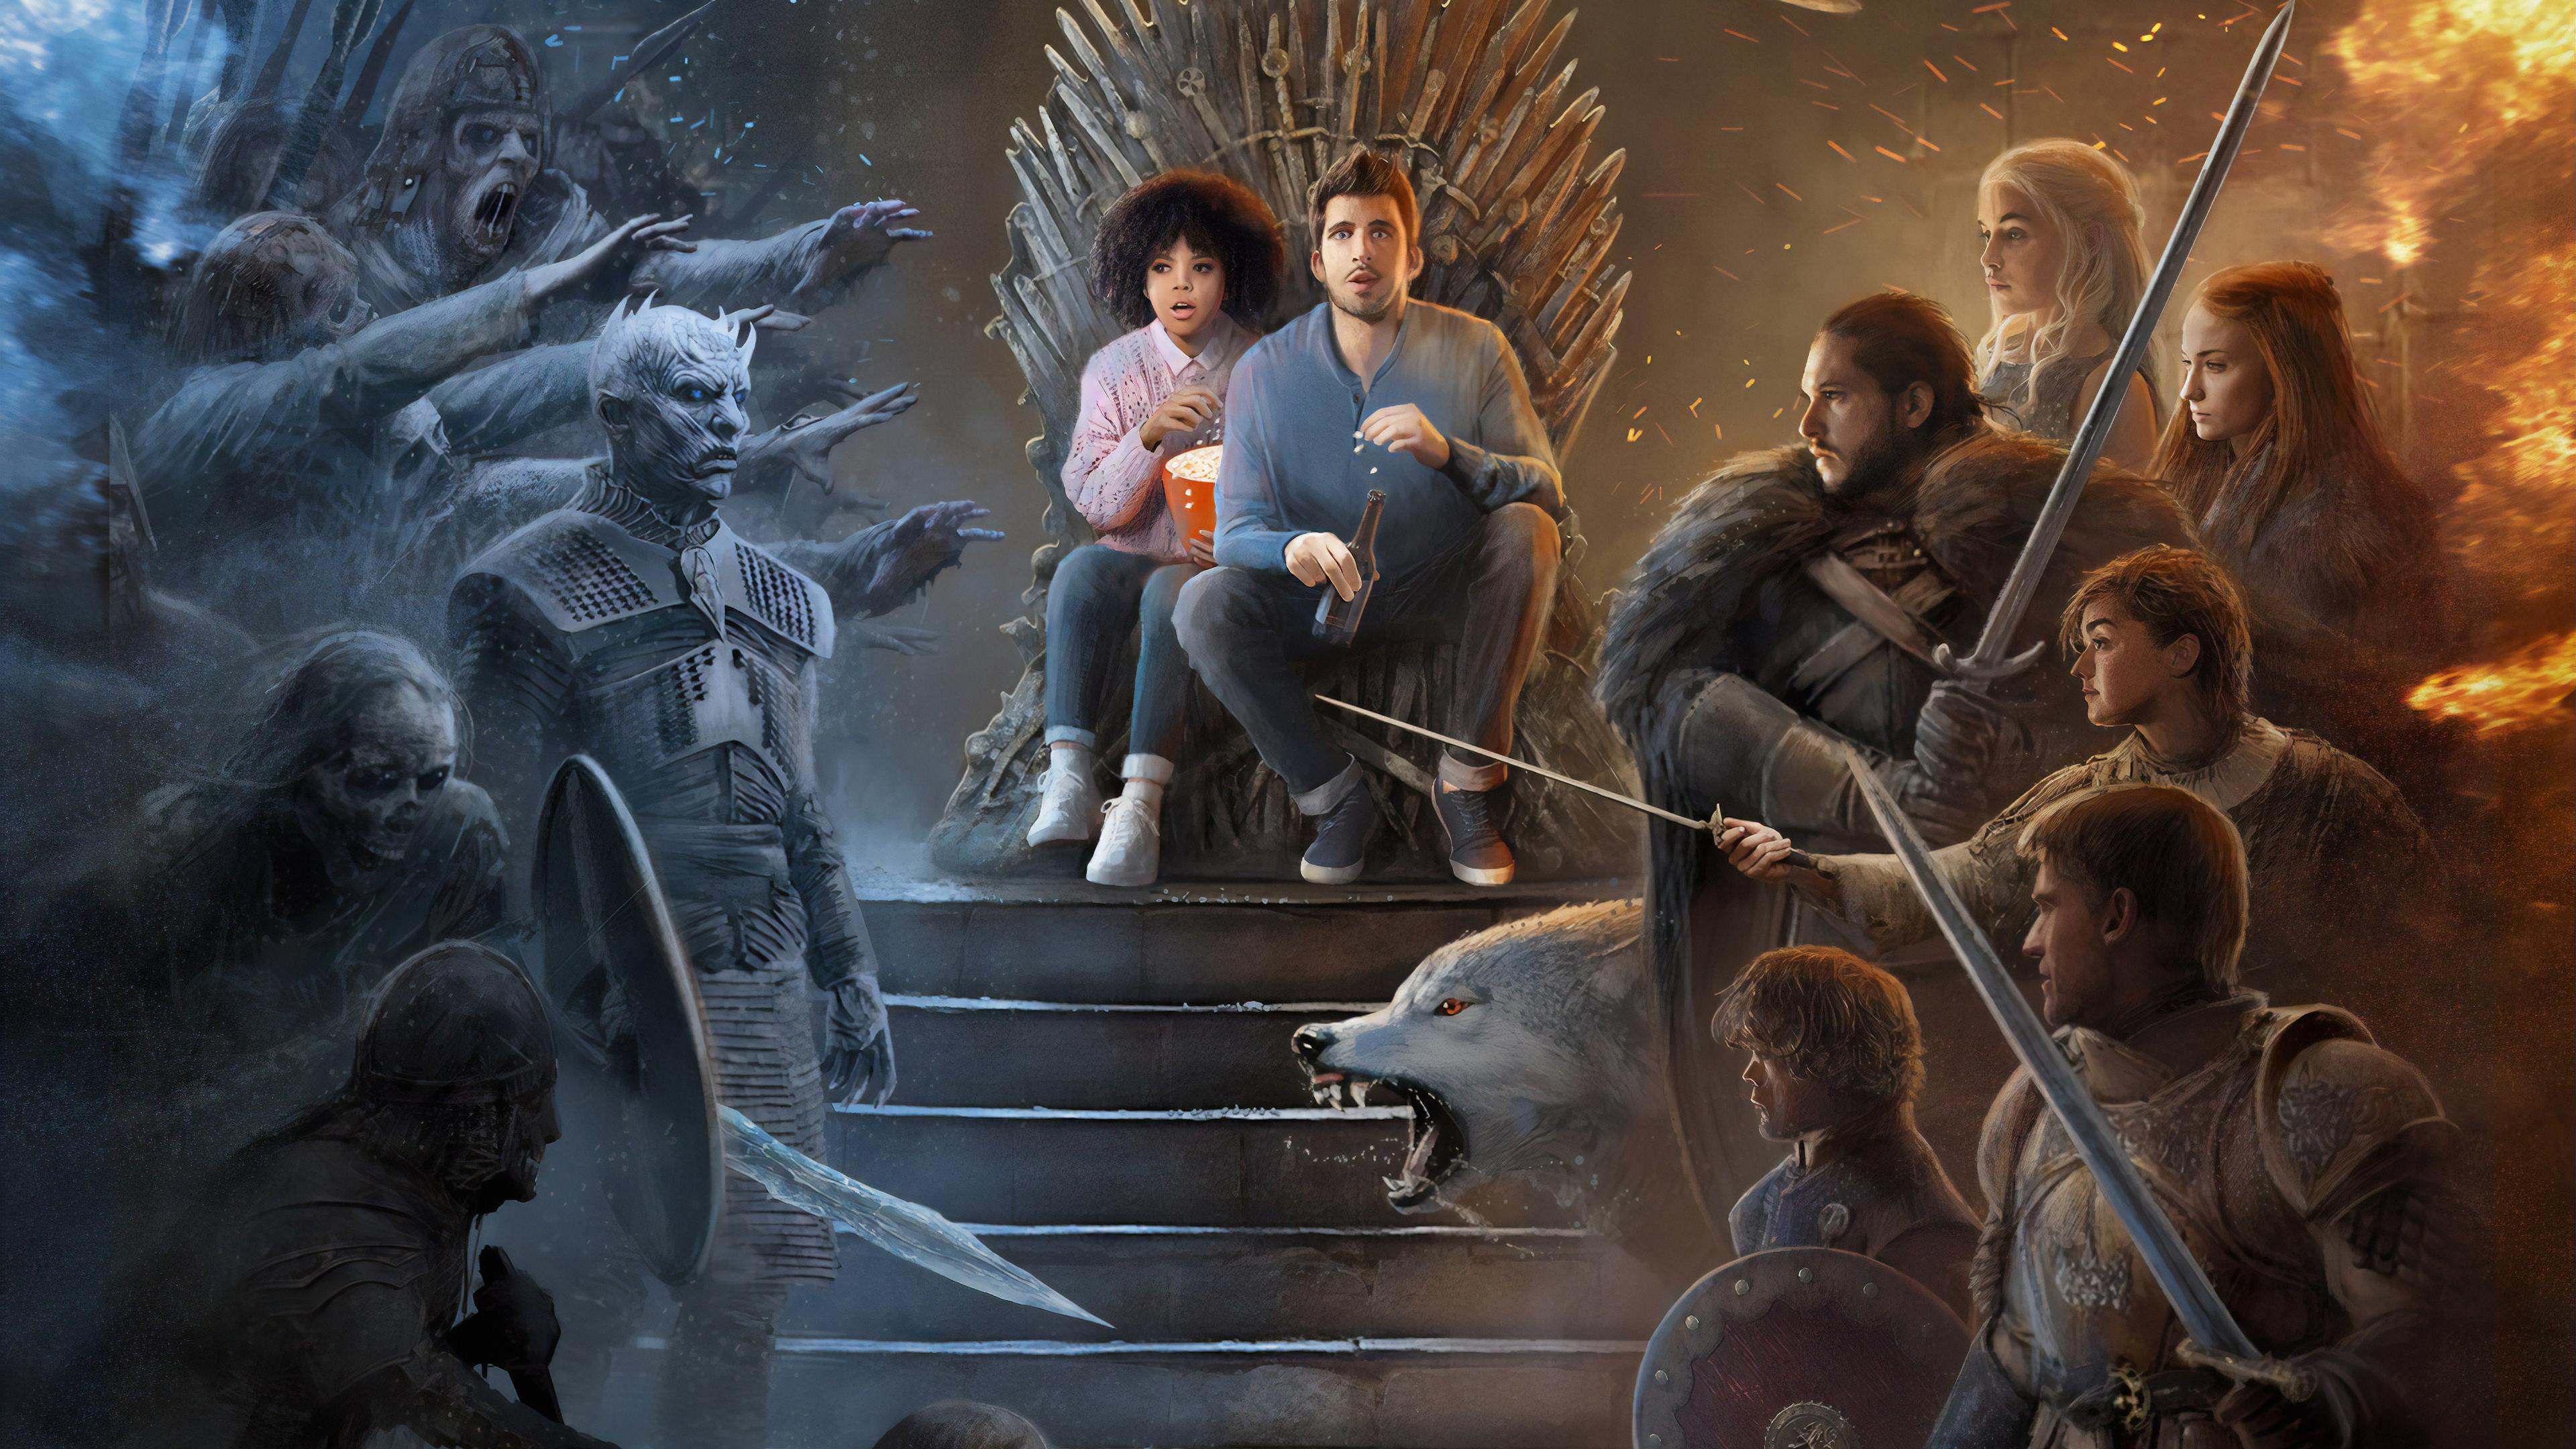 game of thrones fan art 1577915098 - Game Of Thrones Fan Art -